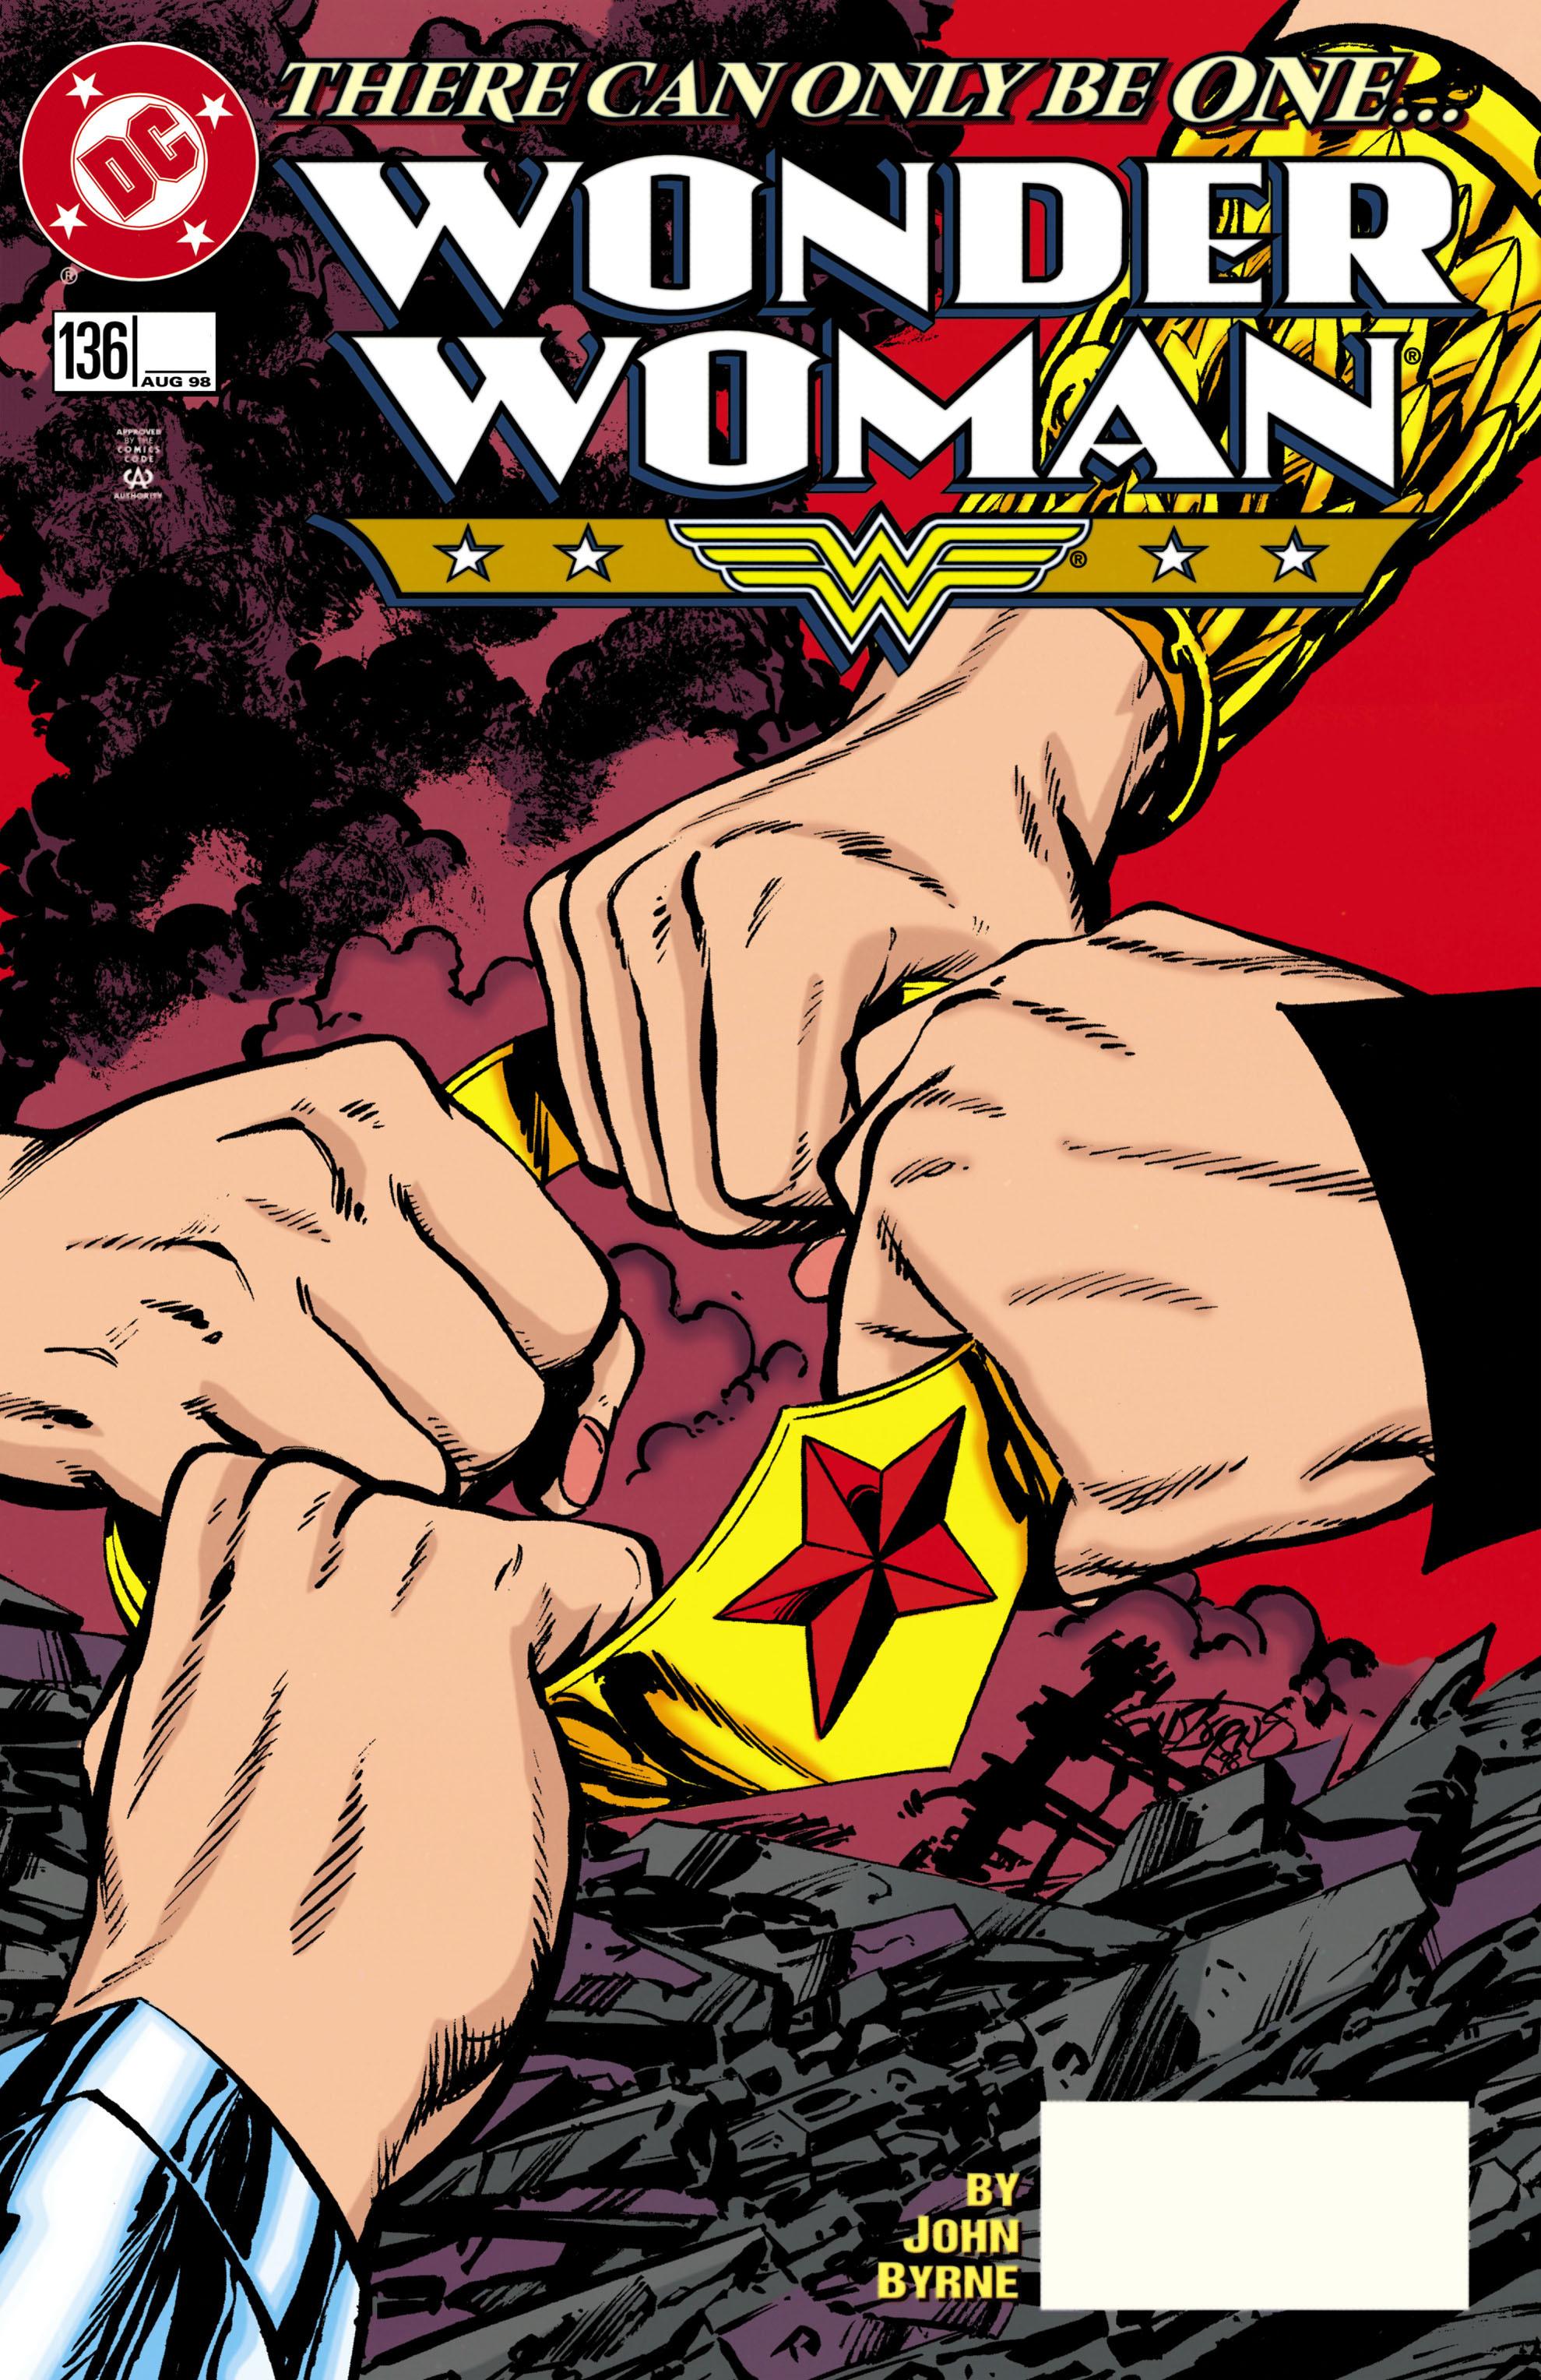 Read online Wonder Woman (1987) comic -  Issue #136 - 1